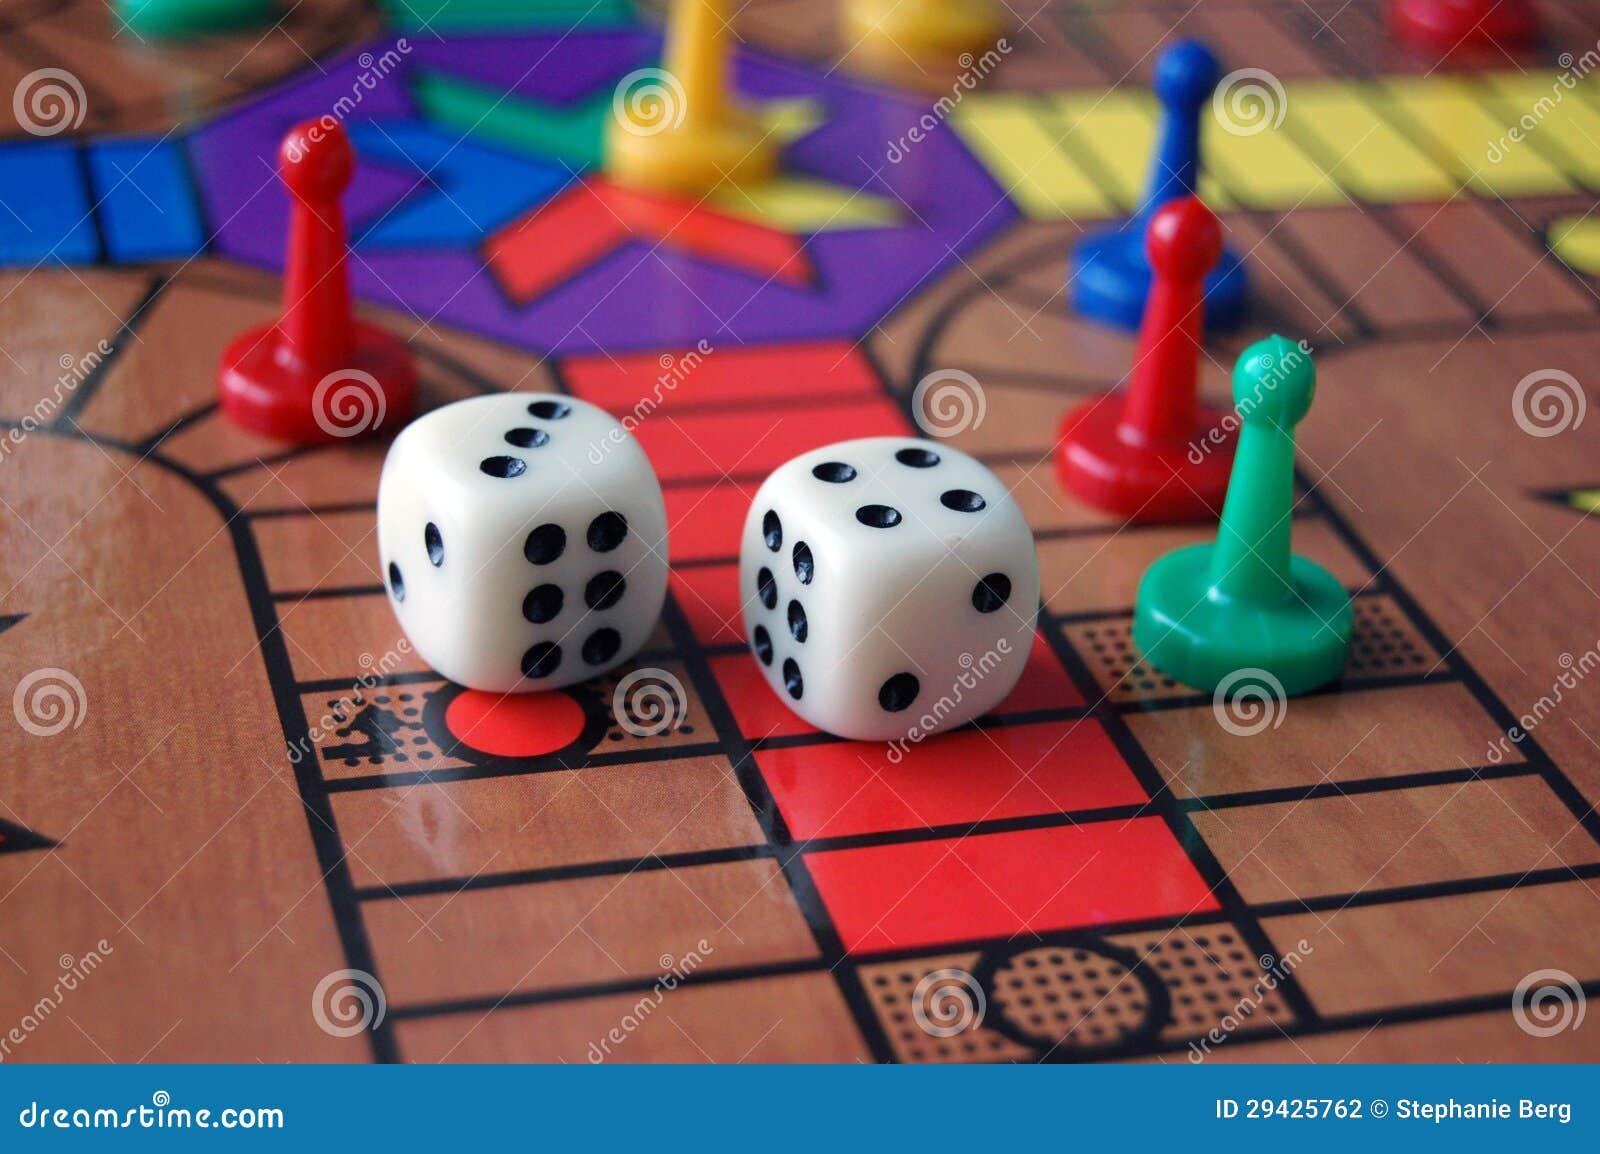 Board Game Sorry